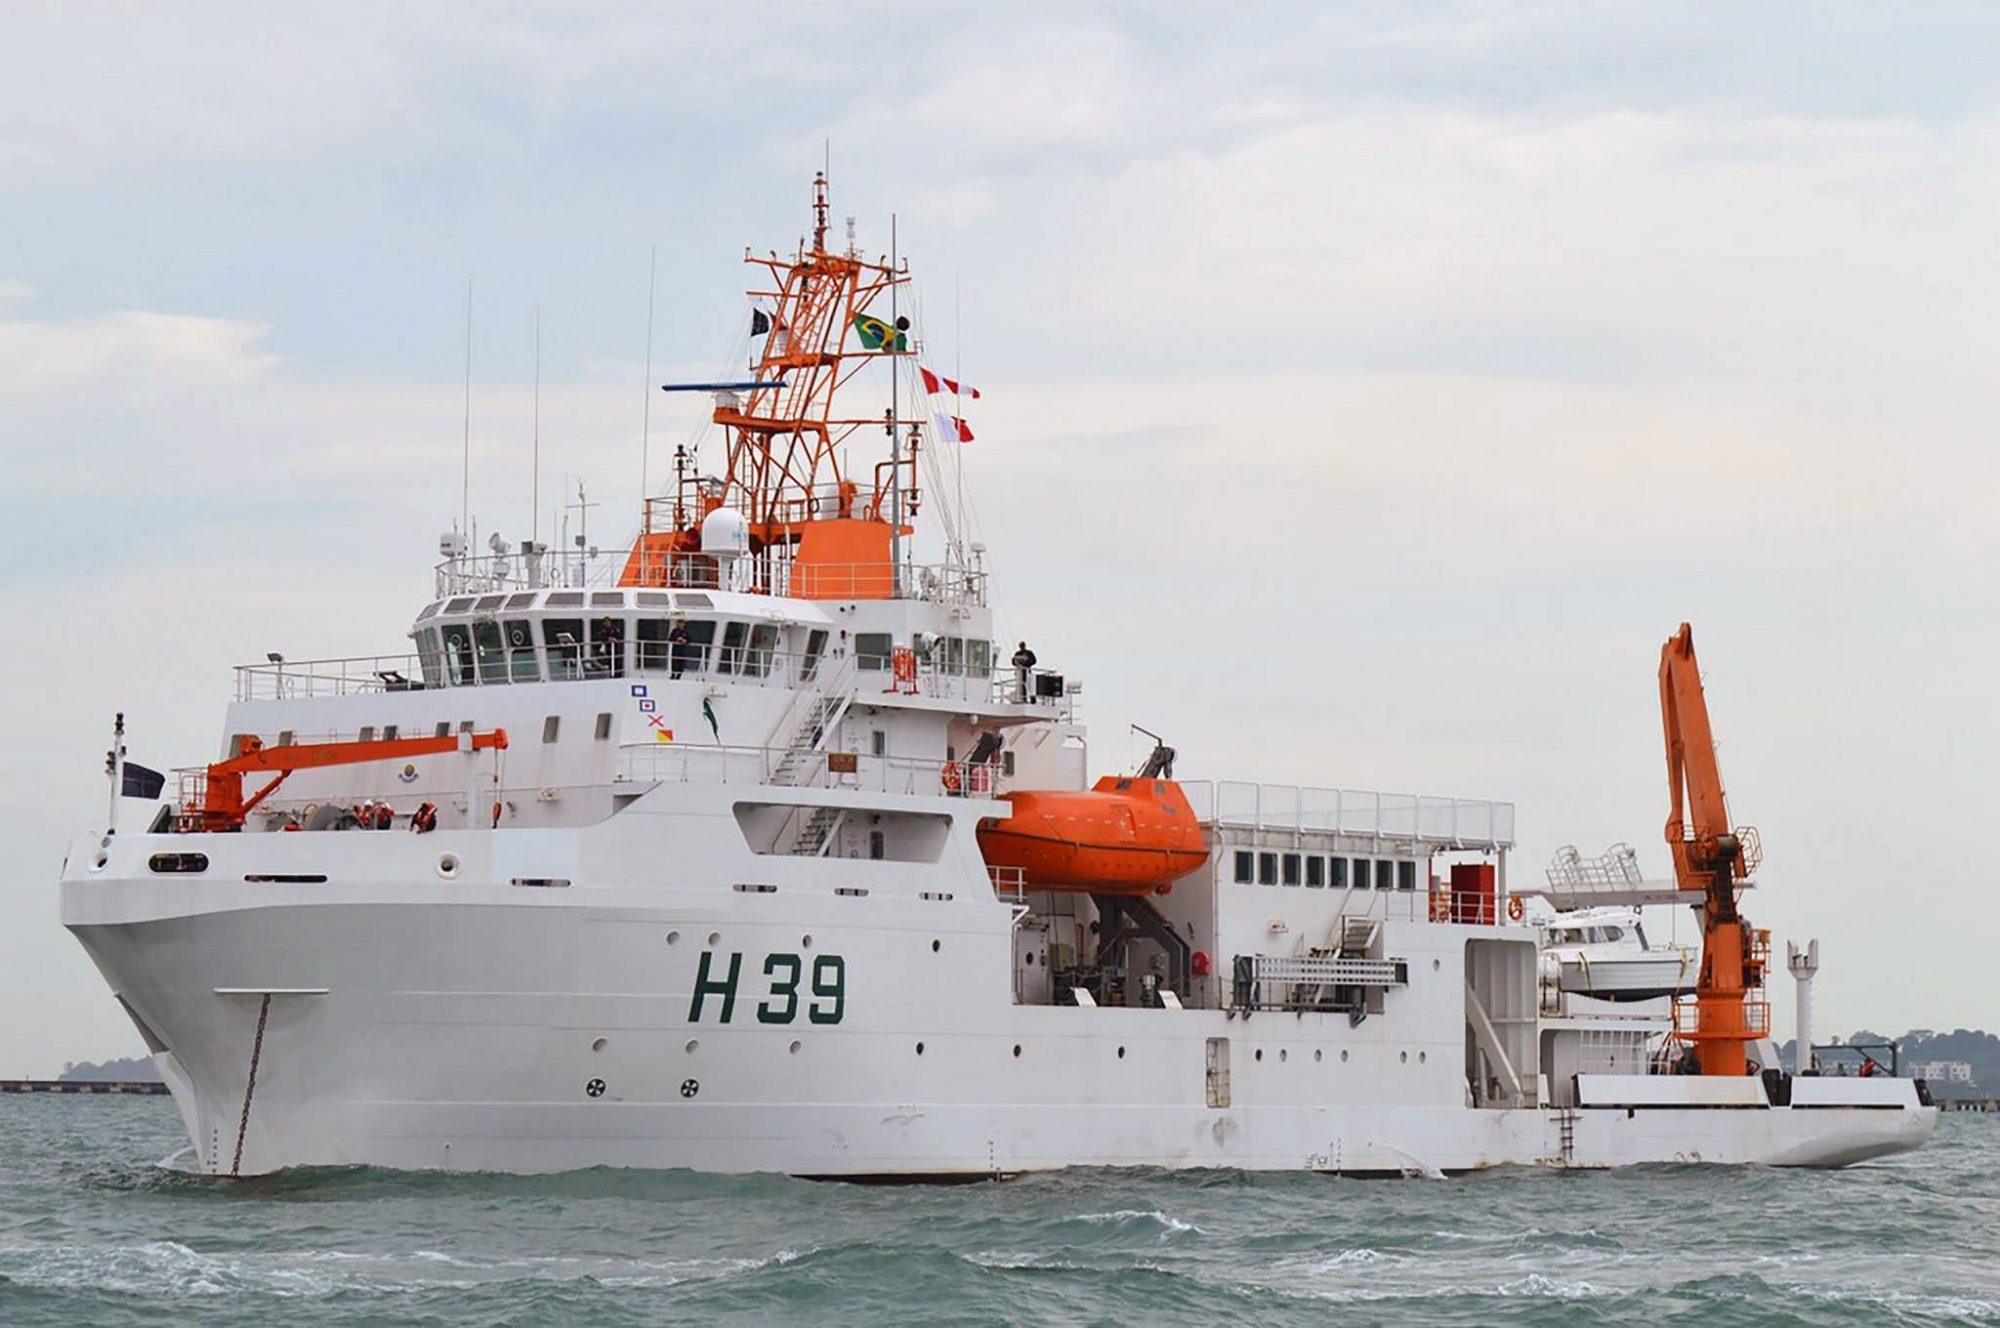 Navio de Pesquisa Hidroceanográfico (NPqHo) Vital de Oliveira – H-39